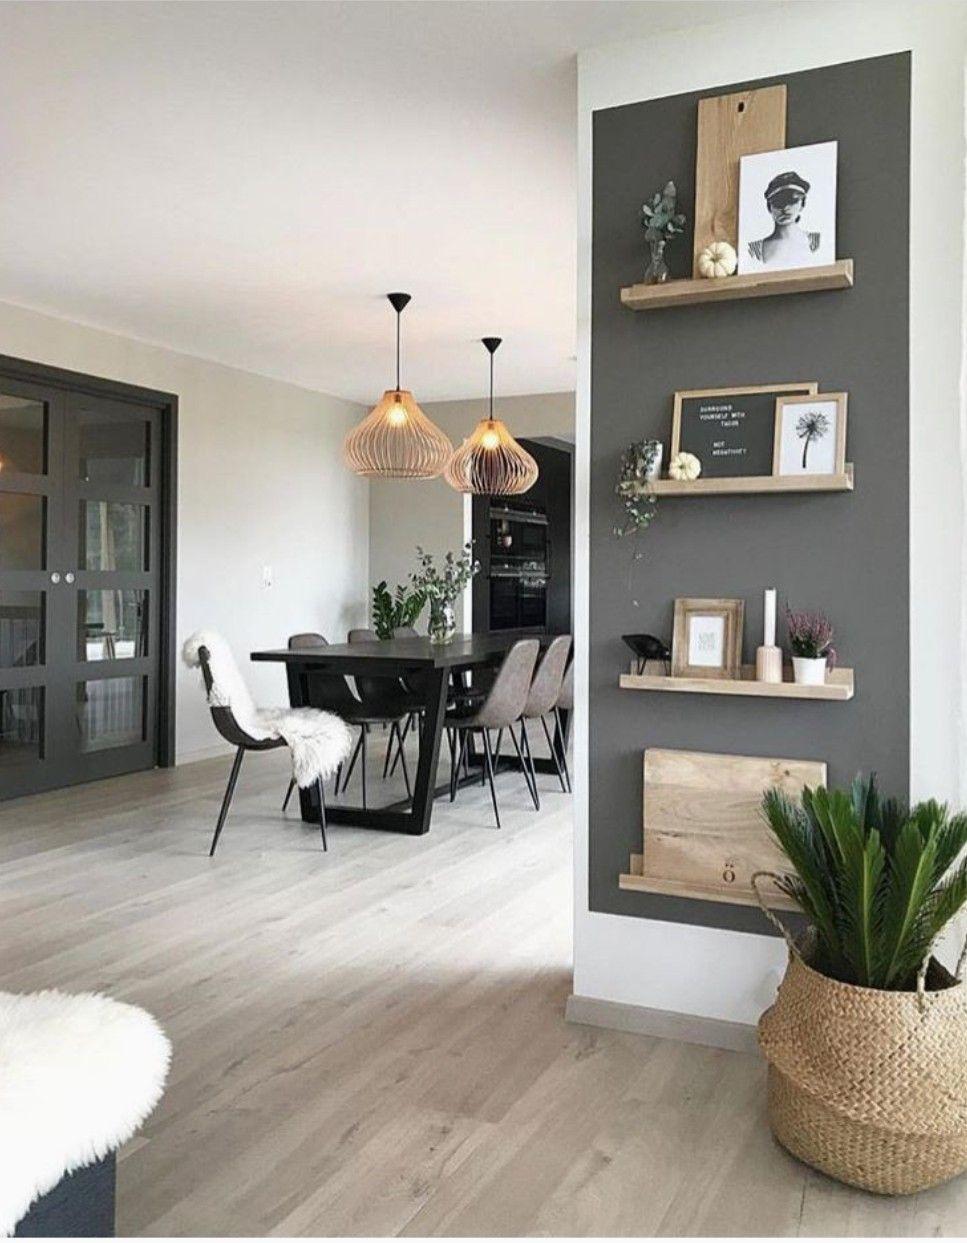 flexa creation early dew : Pin By Kalinka On Decor Details Pinterest Interiors Living